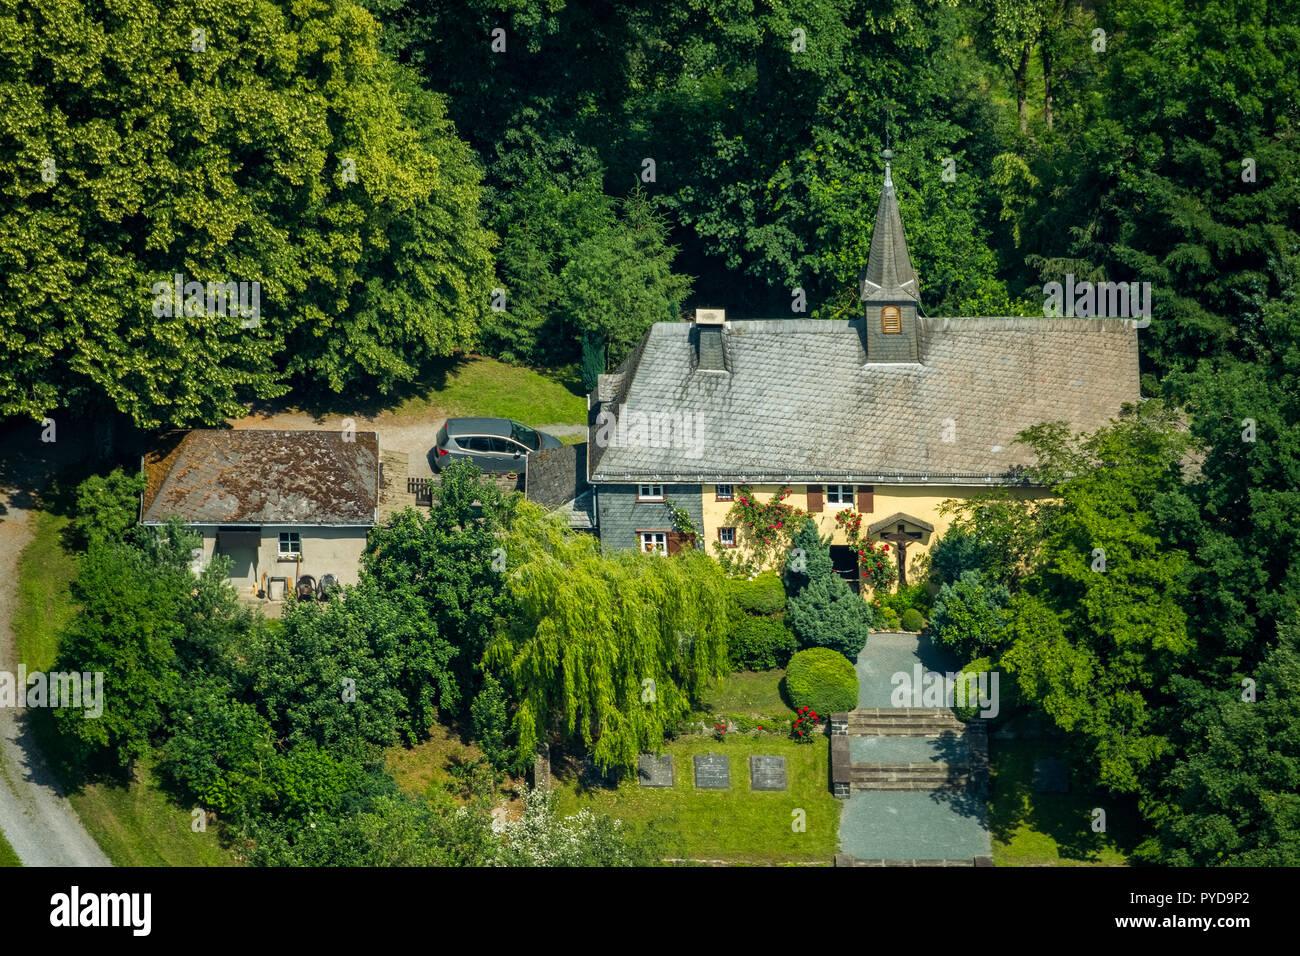 Aerial view, Klausen Chapel on Klausenweg, Meschede, Sauerland, North Rhine-Westphalia, Germany, DEU, Europe, birds-eyes view, aerial view, aerial pho - Stock Image